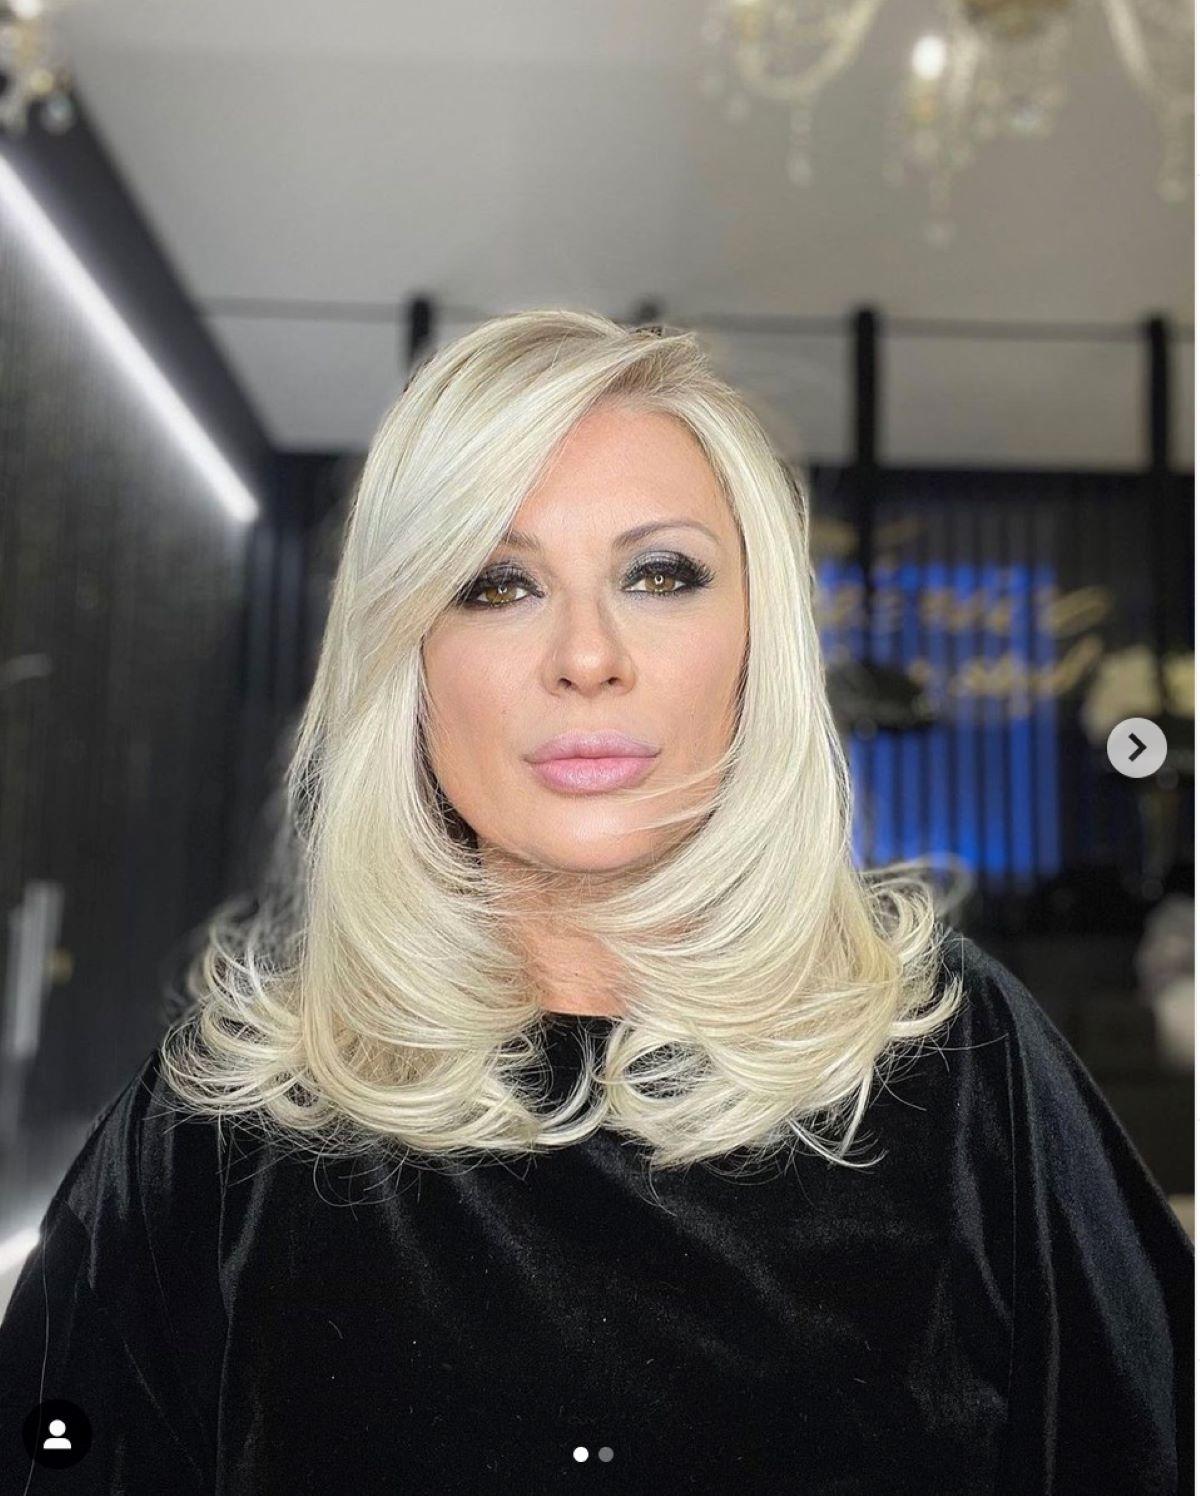 Tina Cipollari Motivo Rottura Vincenzo Ferrara Tradimento